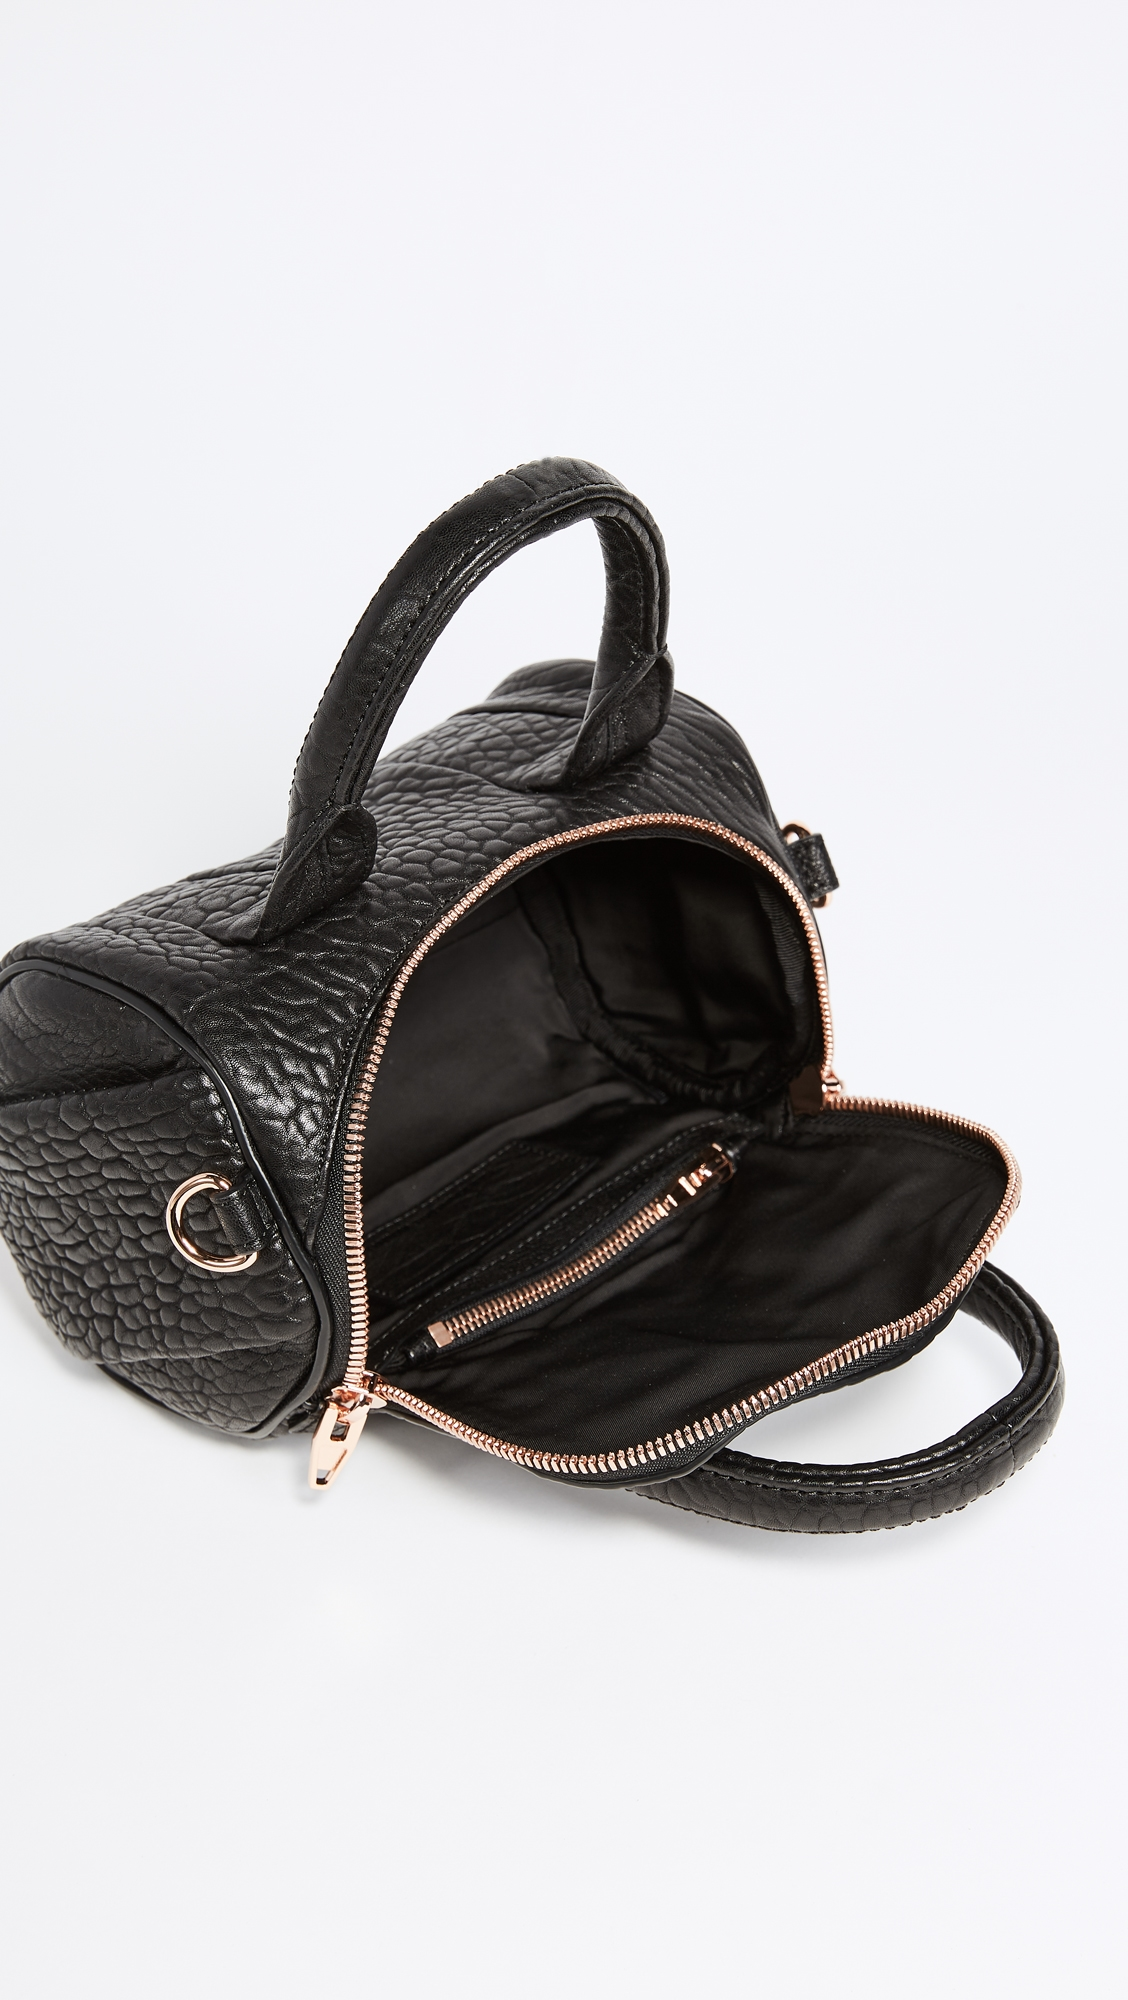 Миниатюрная сумка Rockie Alexander Wang  (AWANG4194712867314)